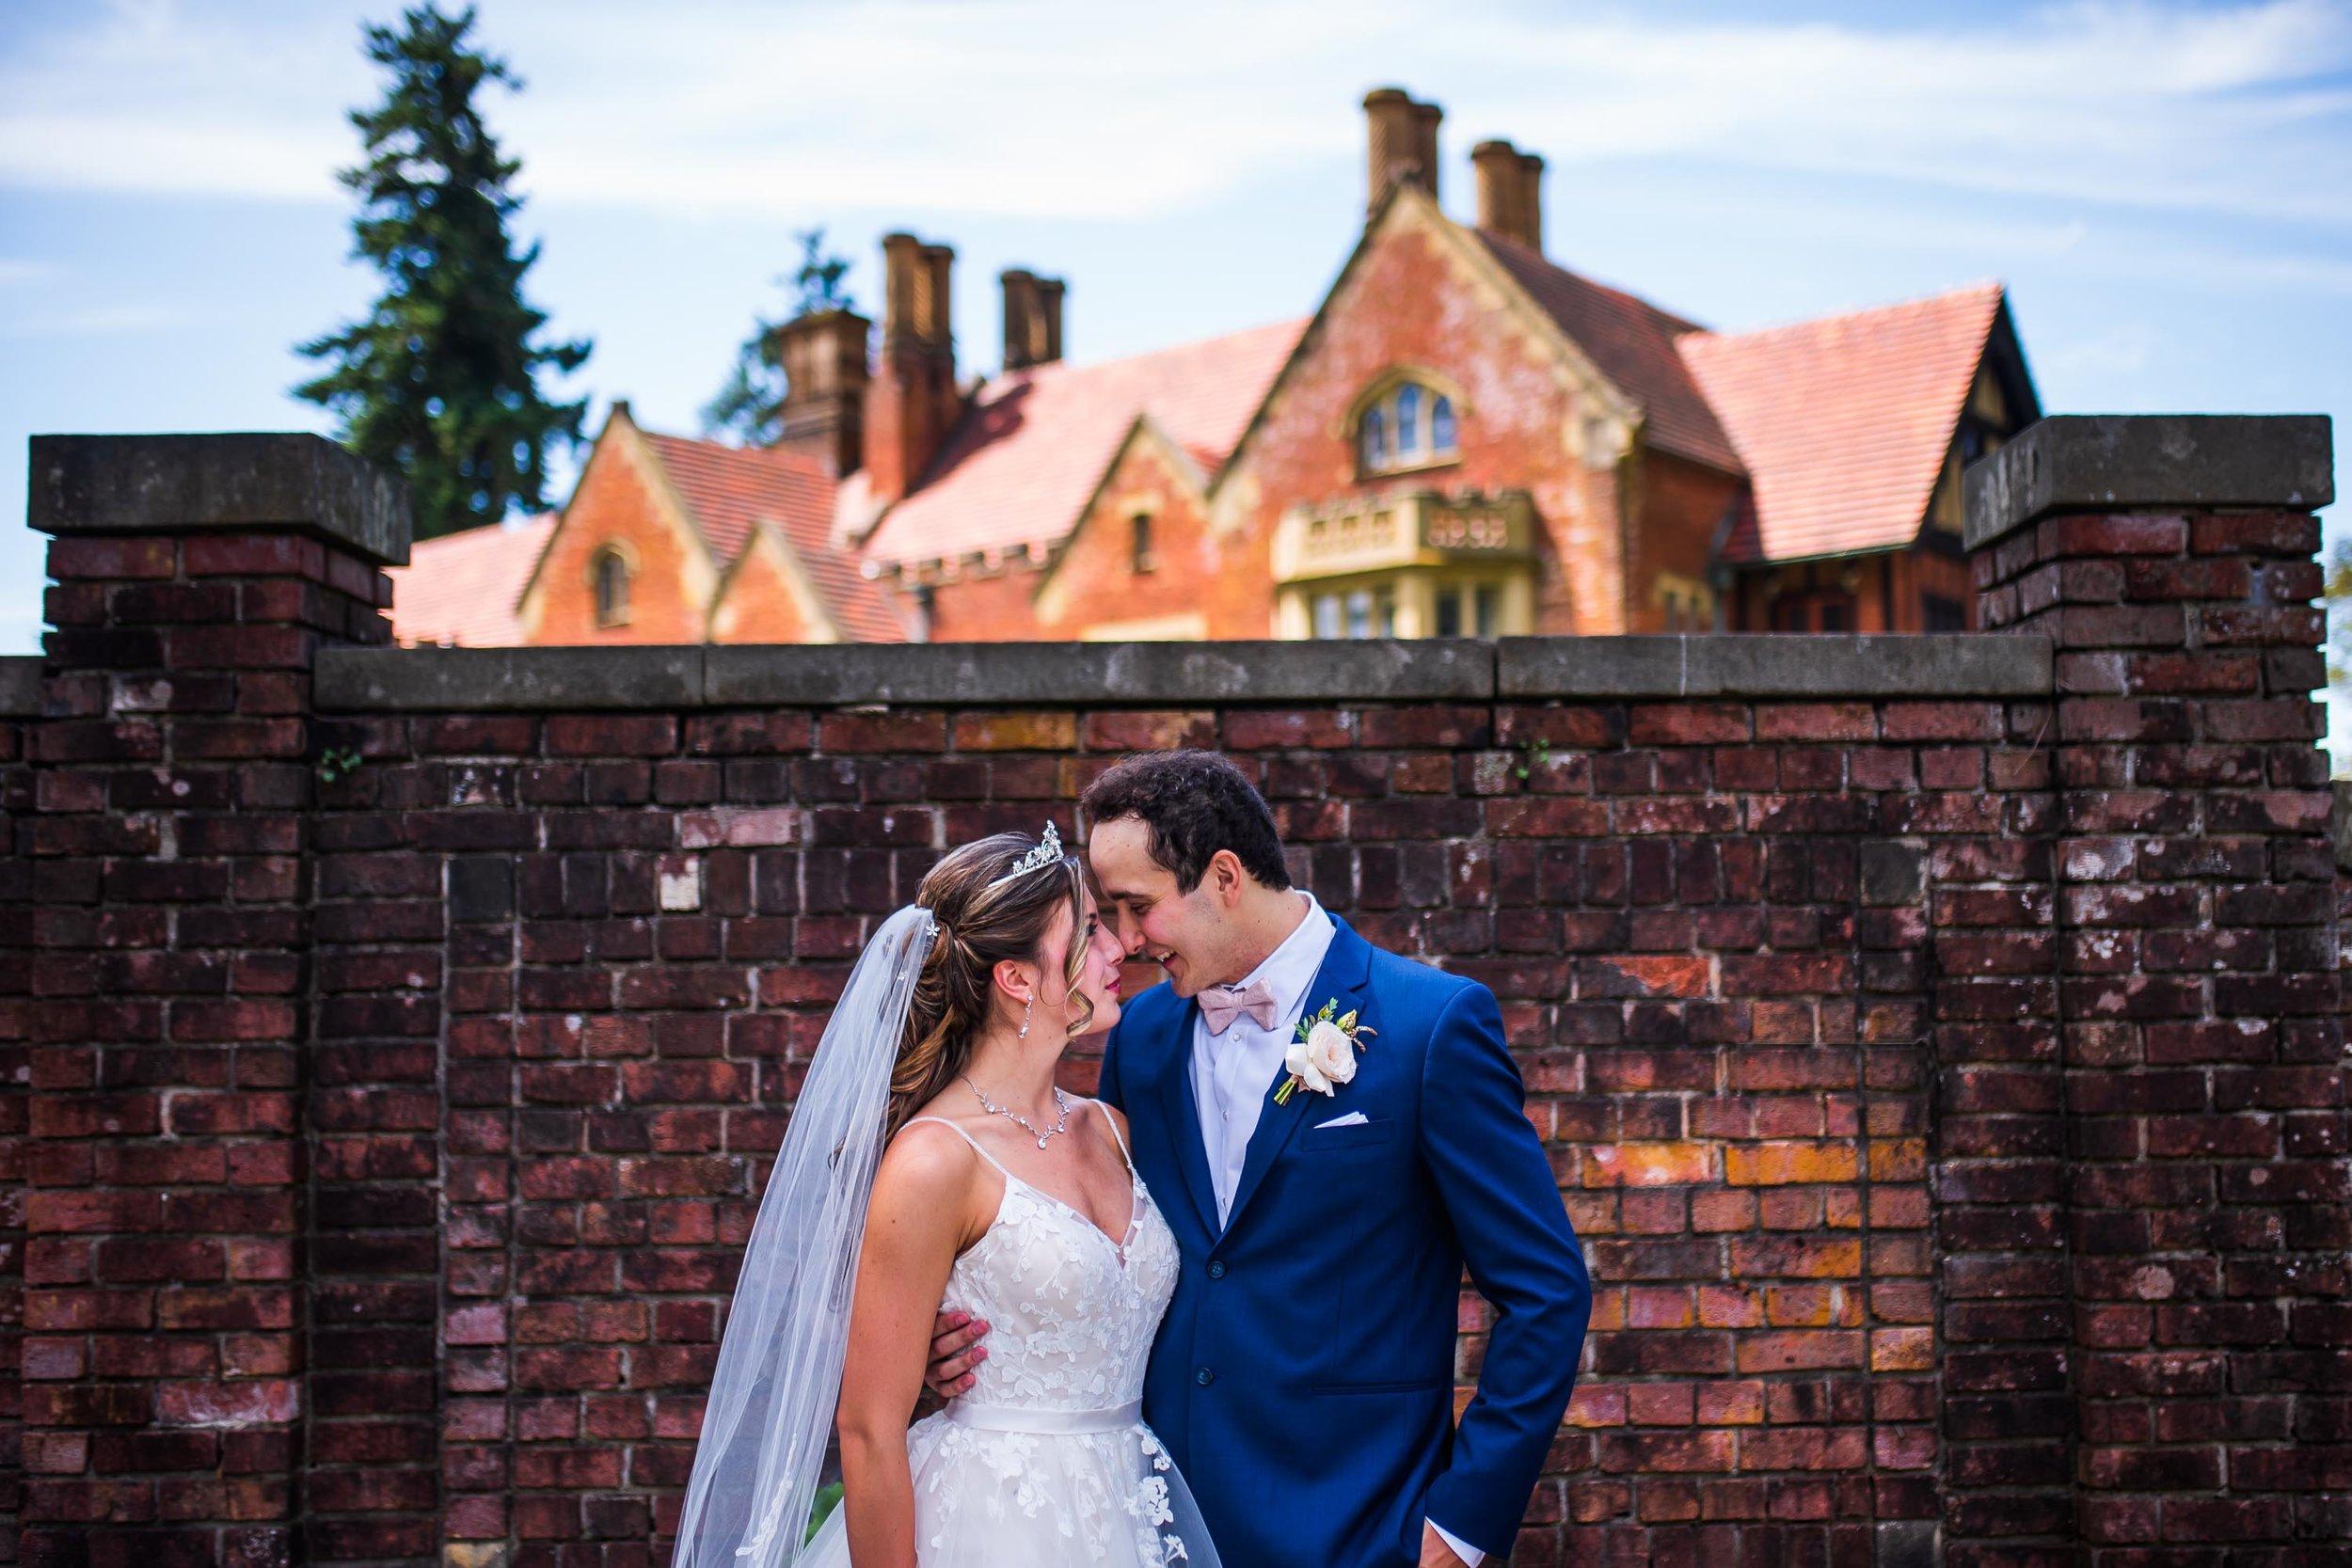 thornewood castle wedding 21.jpg